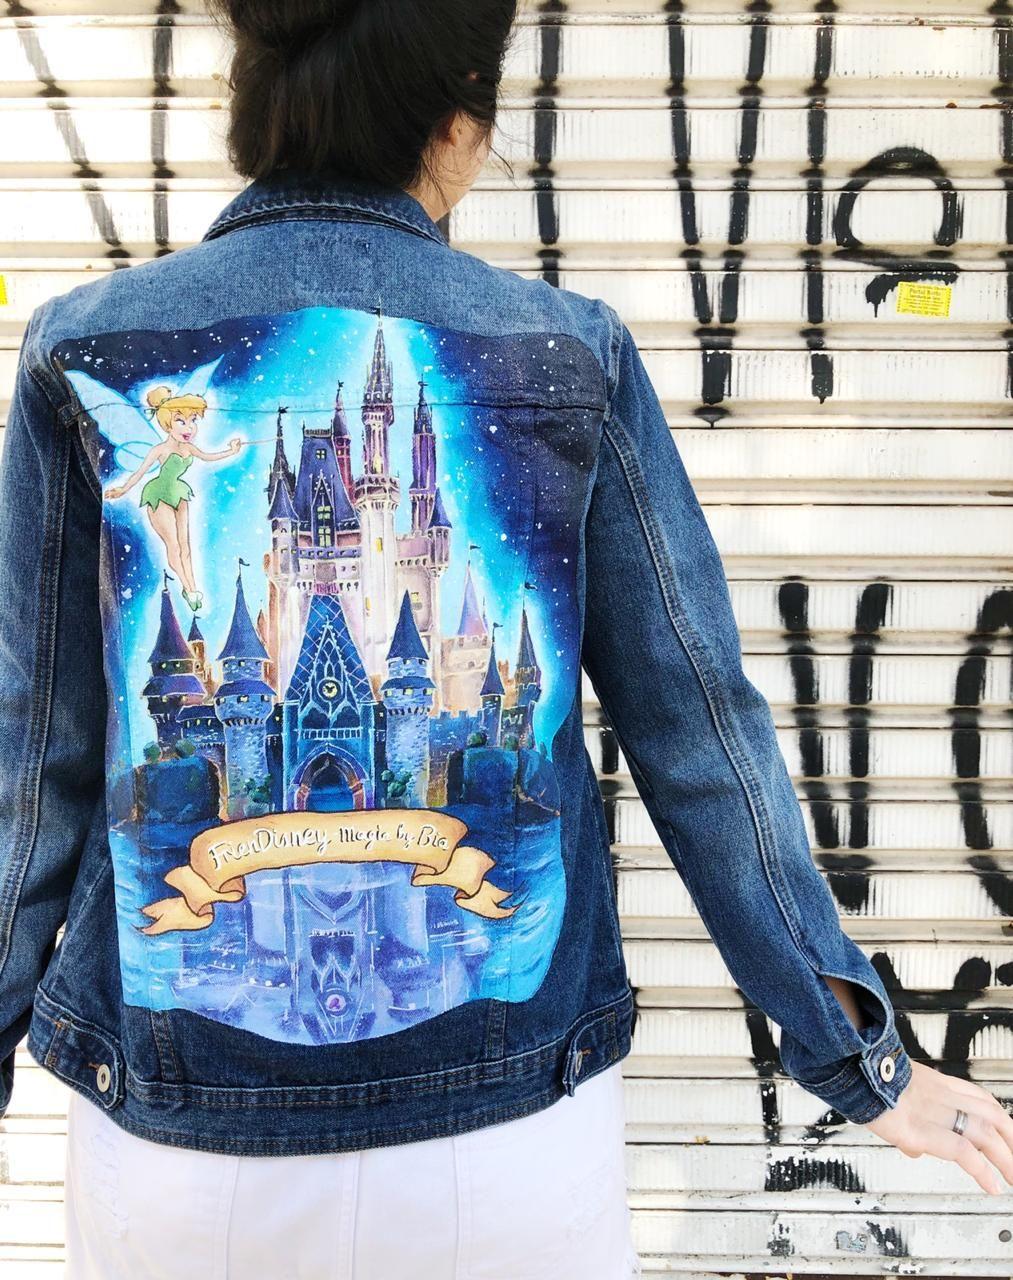 Disney Castle Jacket Painted Clothes Diy Jackets Painted Denim Jacket [ 1280 x 1013 Pixel ]